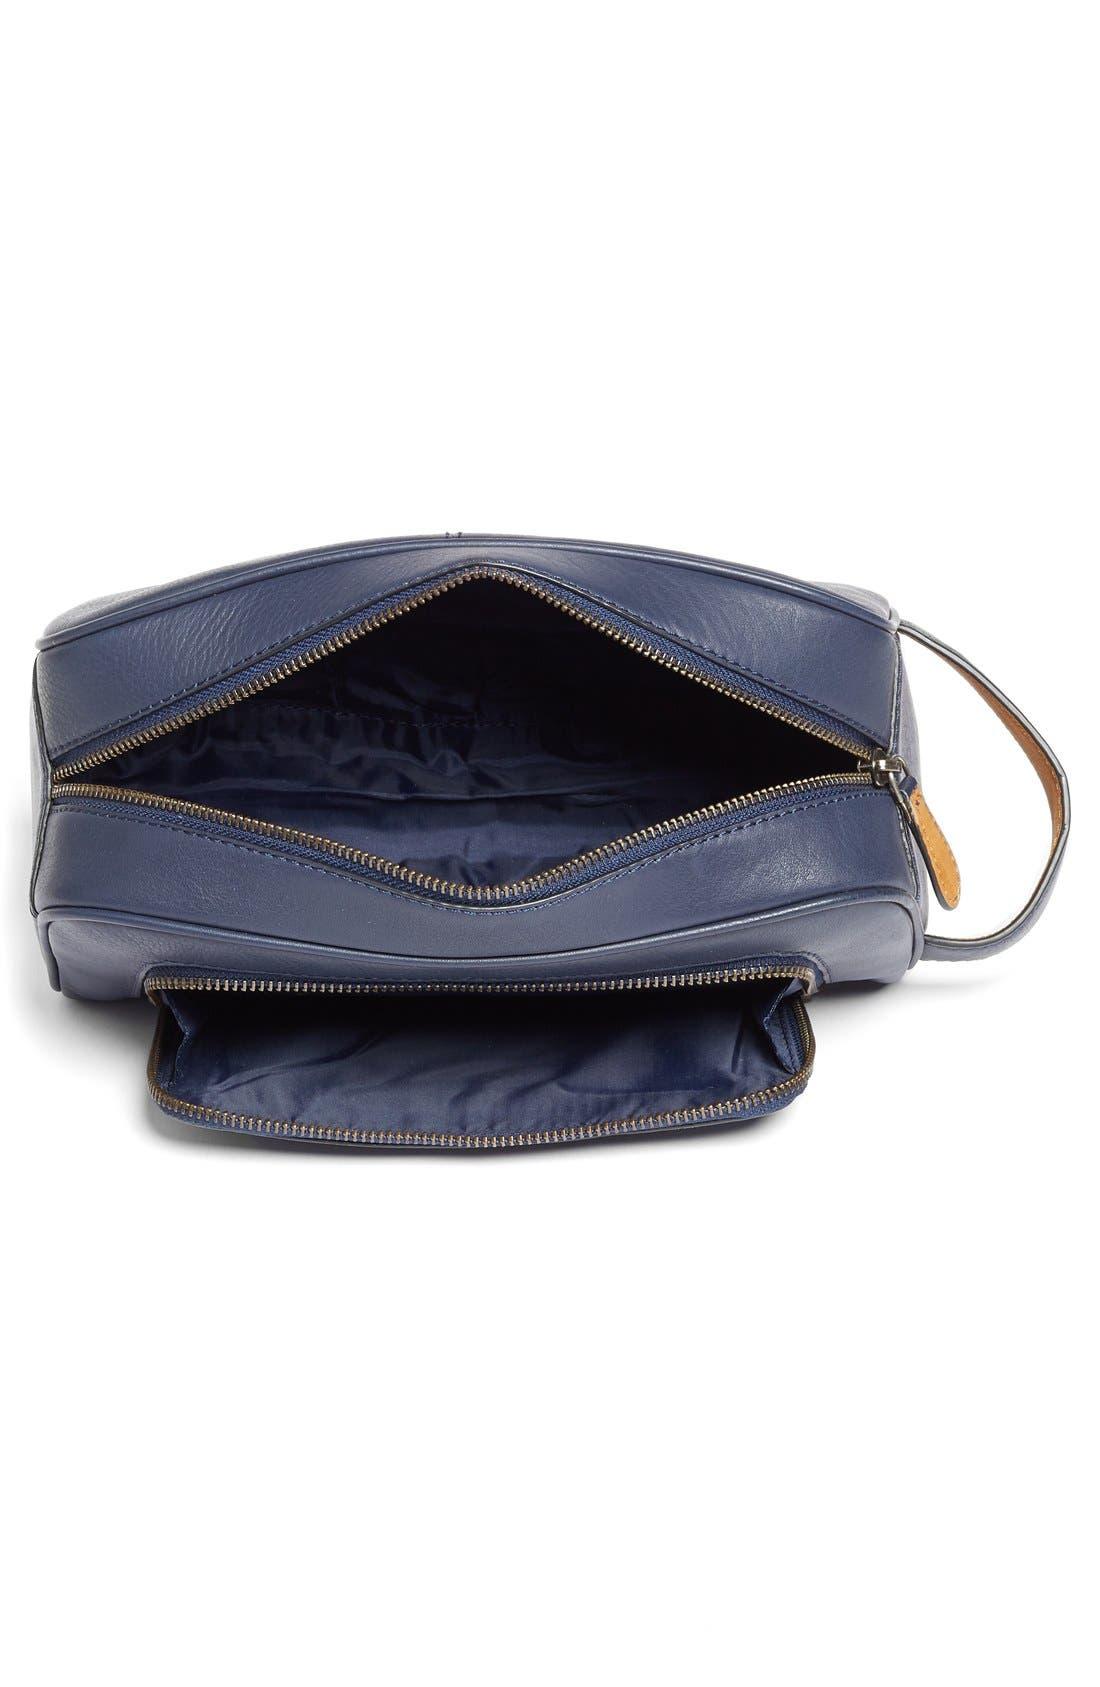 'Footsy' Leather Travel Kit,                             Alternate thumbnail 2, color,                             410